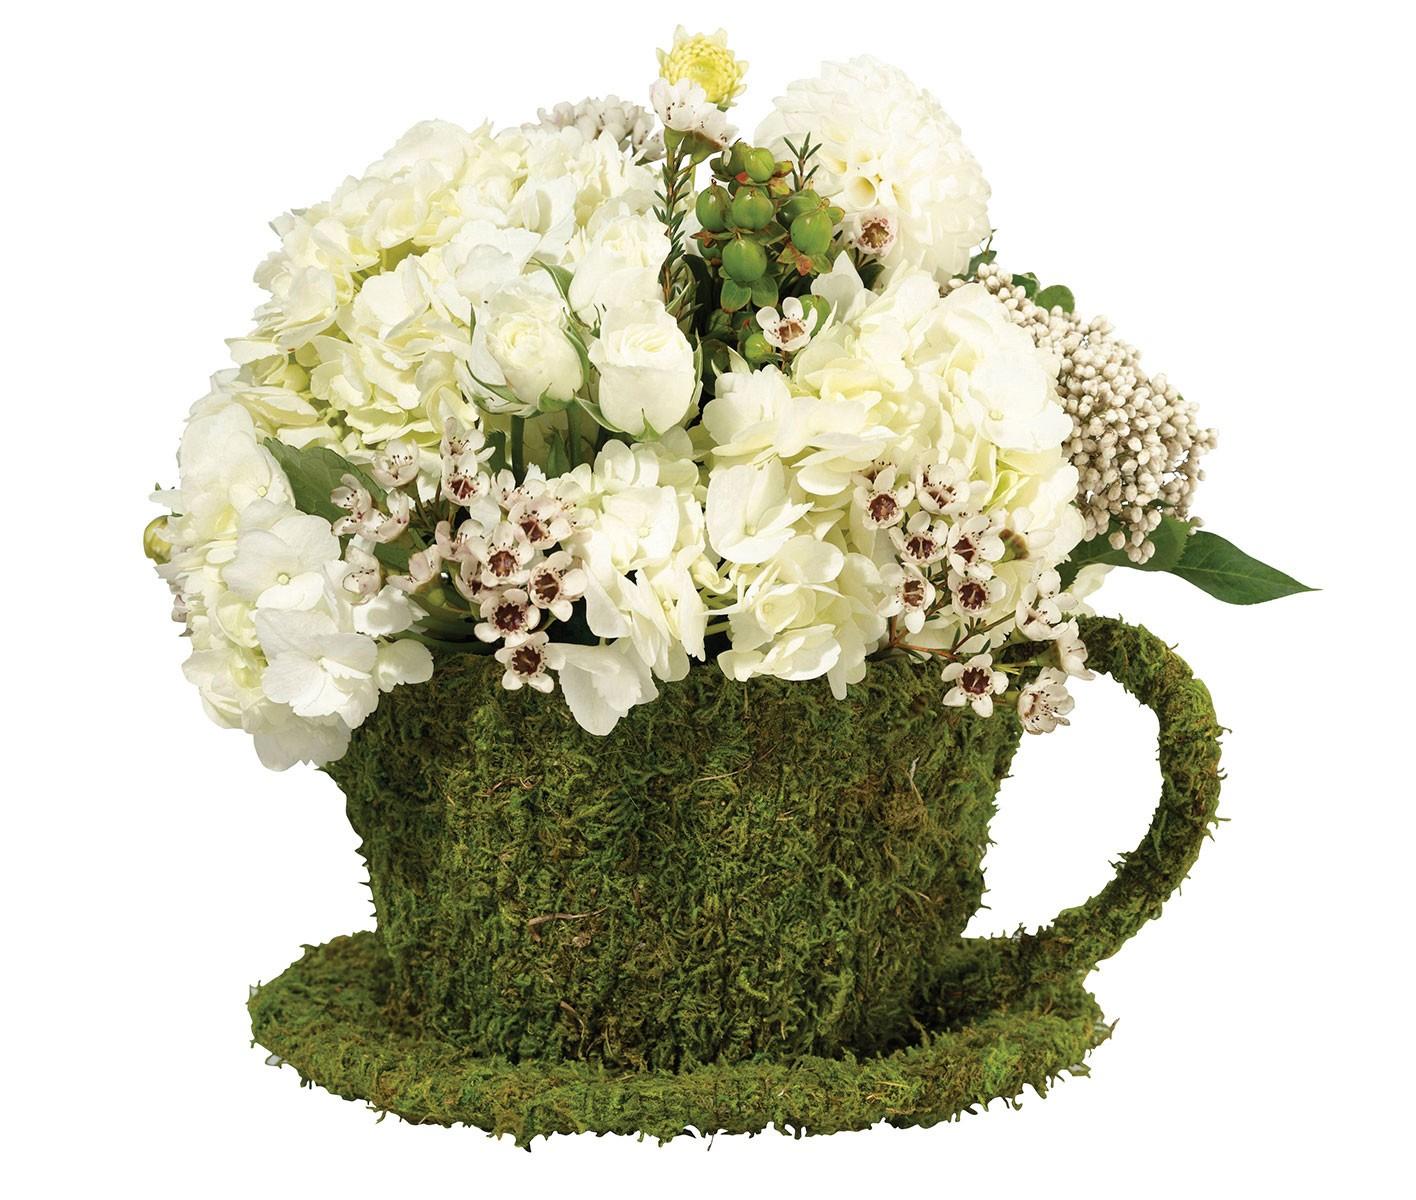 Moss Decor Teacup